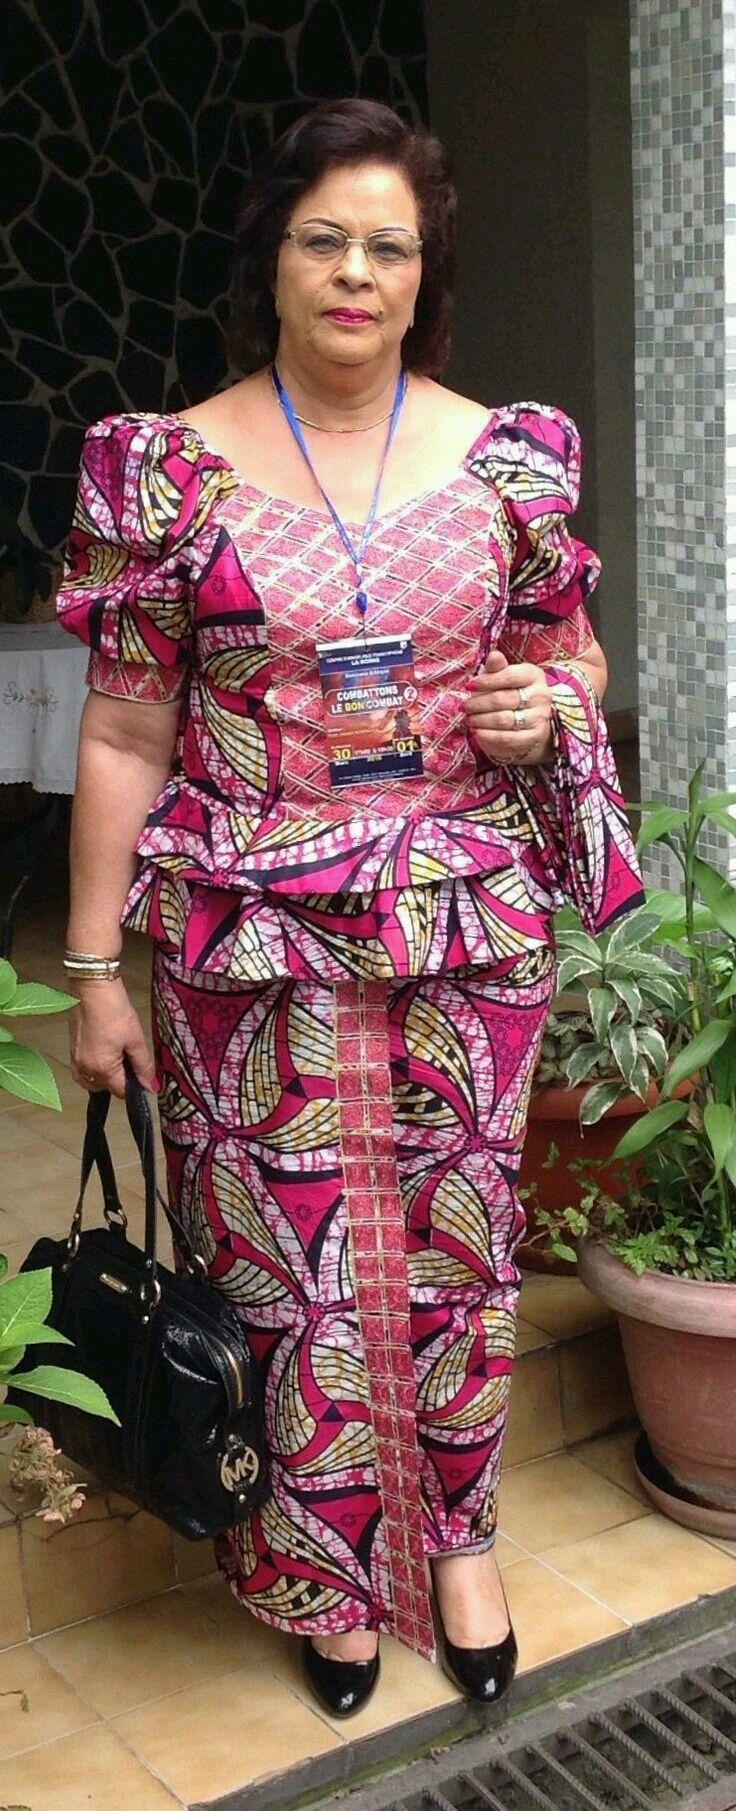 Épinglé par jolie sur 1   Mode africaine, Mode africaine robe, Tenue africaine